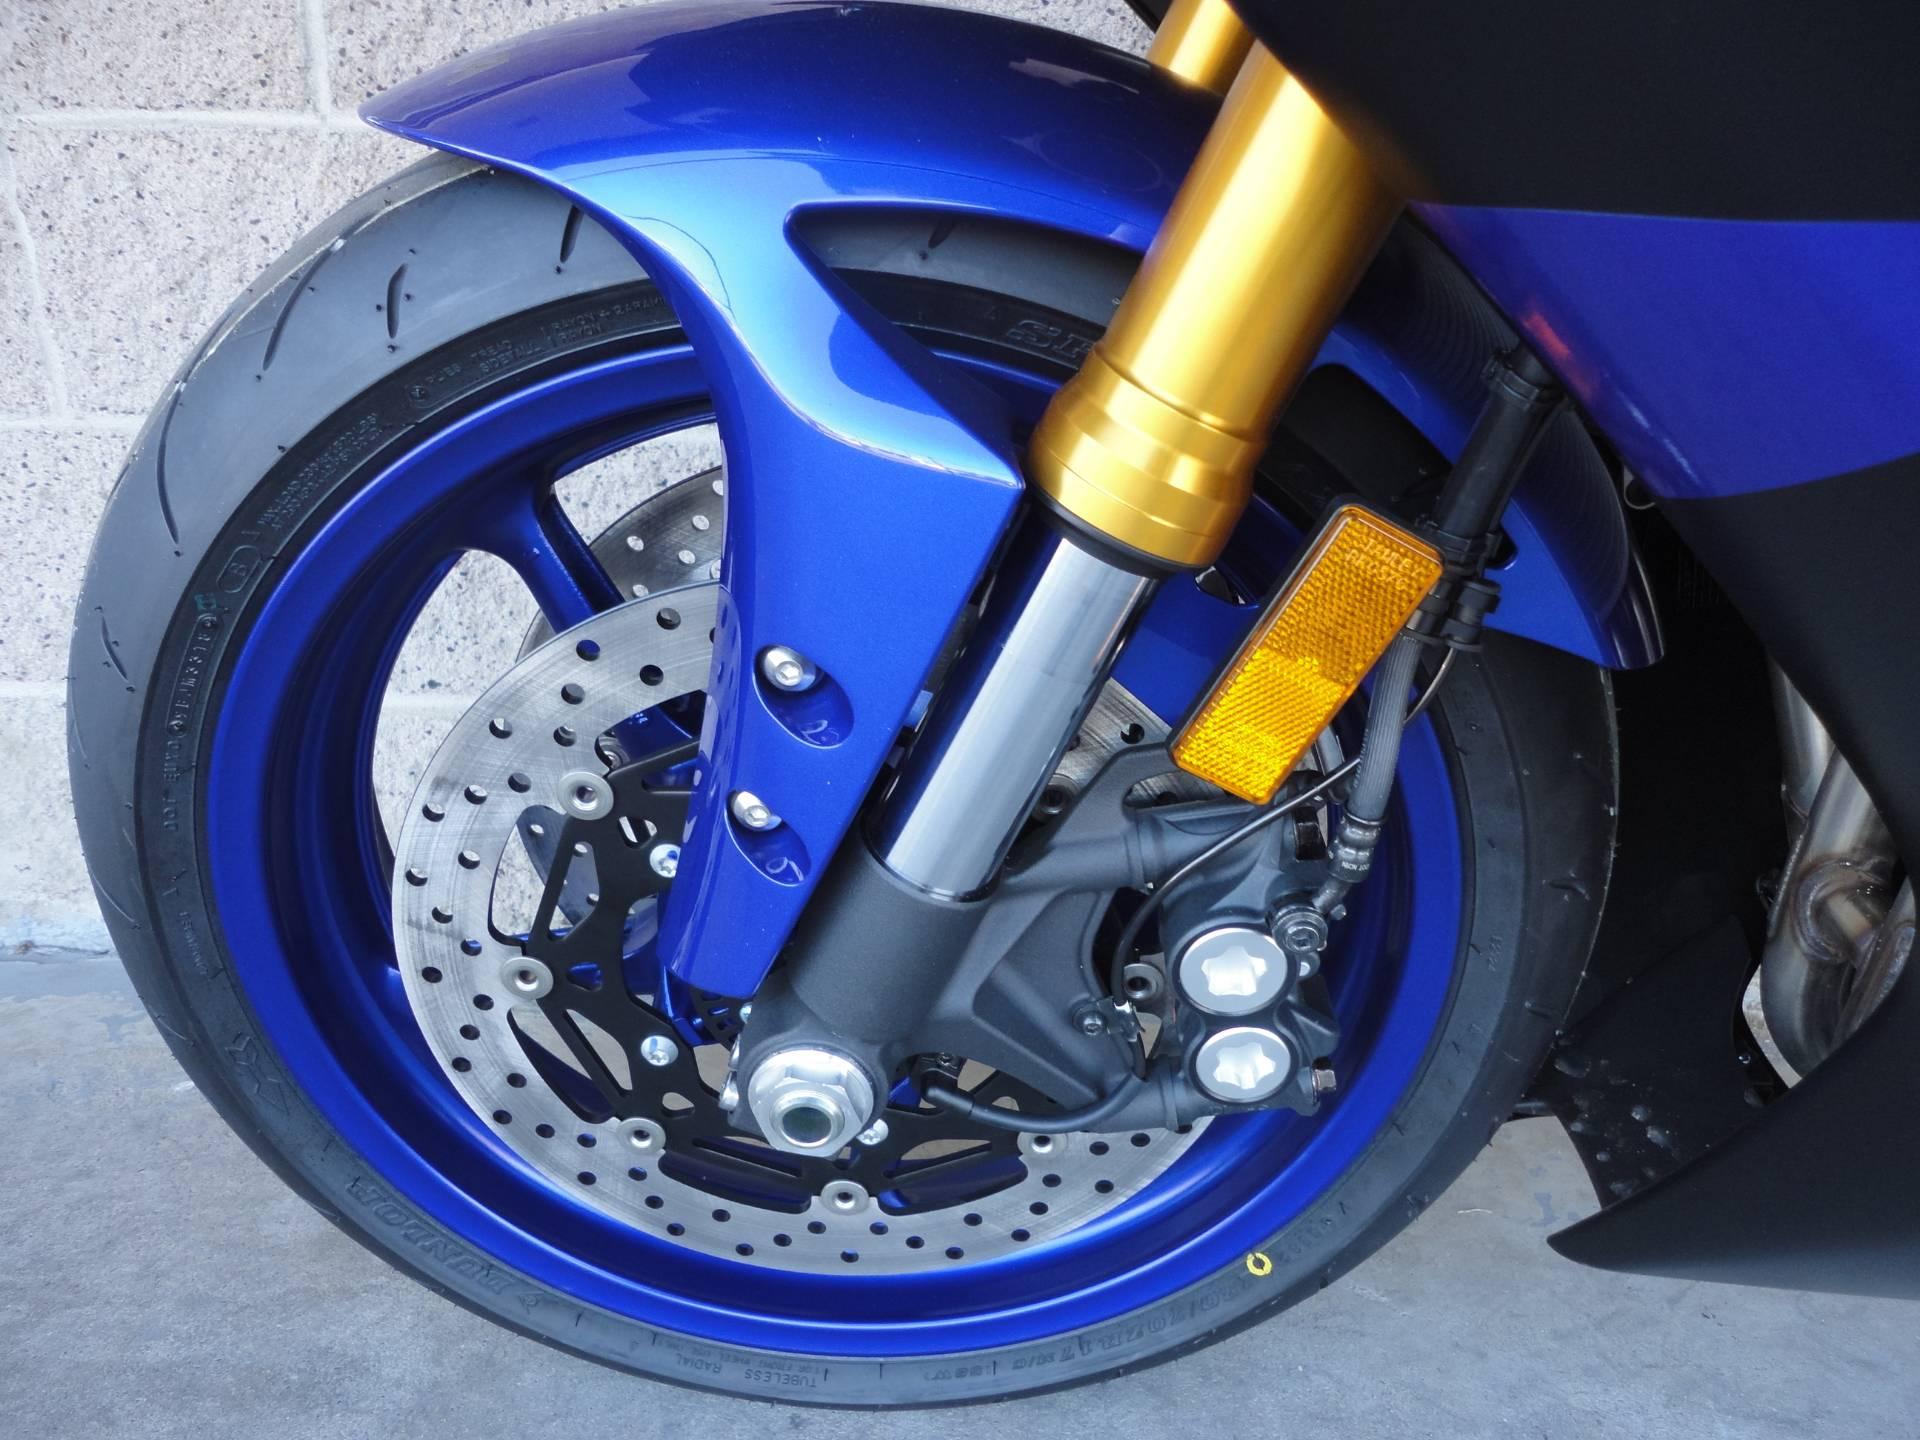 2019 Yamaha YZF-R6 4